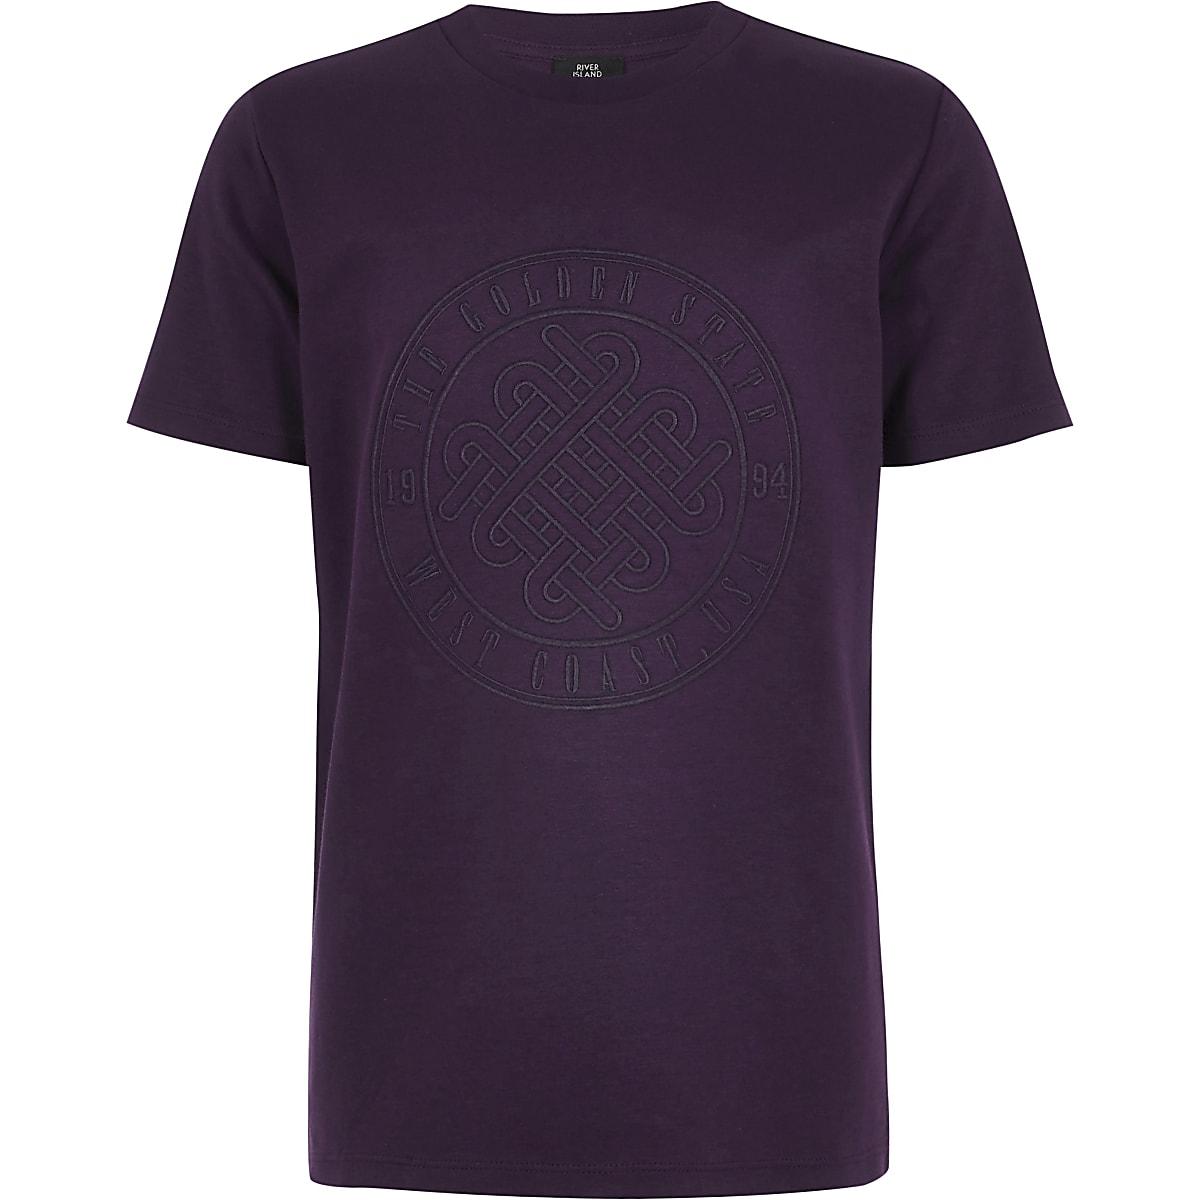 Boys purple 'Golden state' T-shirt